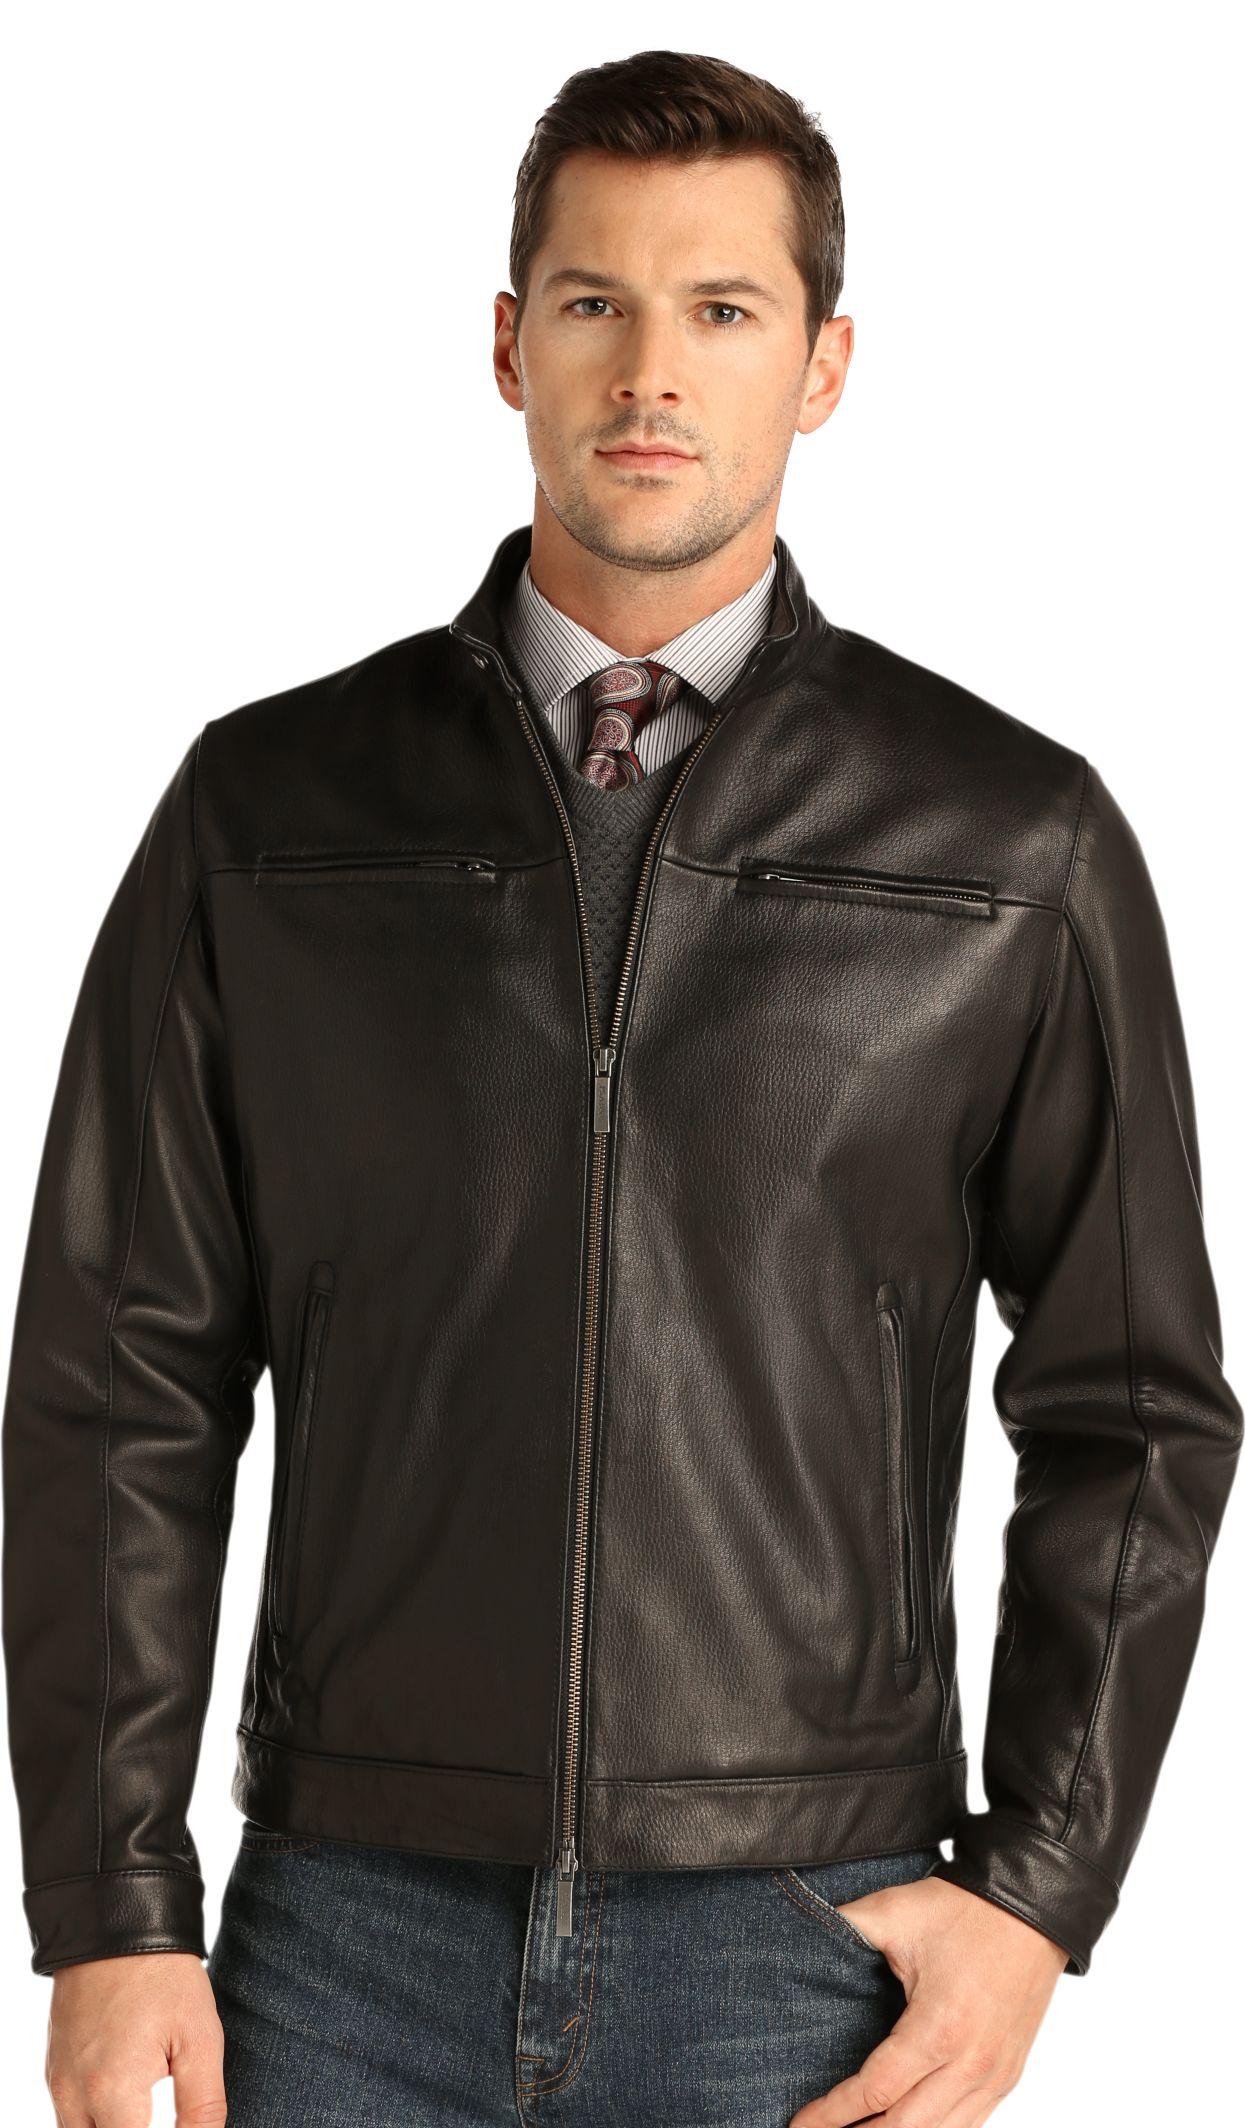 Leather jacket for men - Mens Leather Jackets H M Modern Fashion Jacket Photo Blog